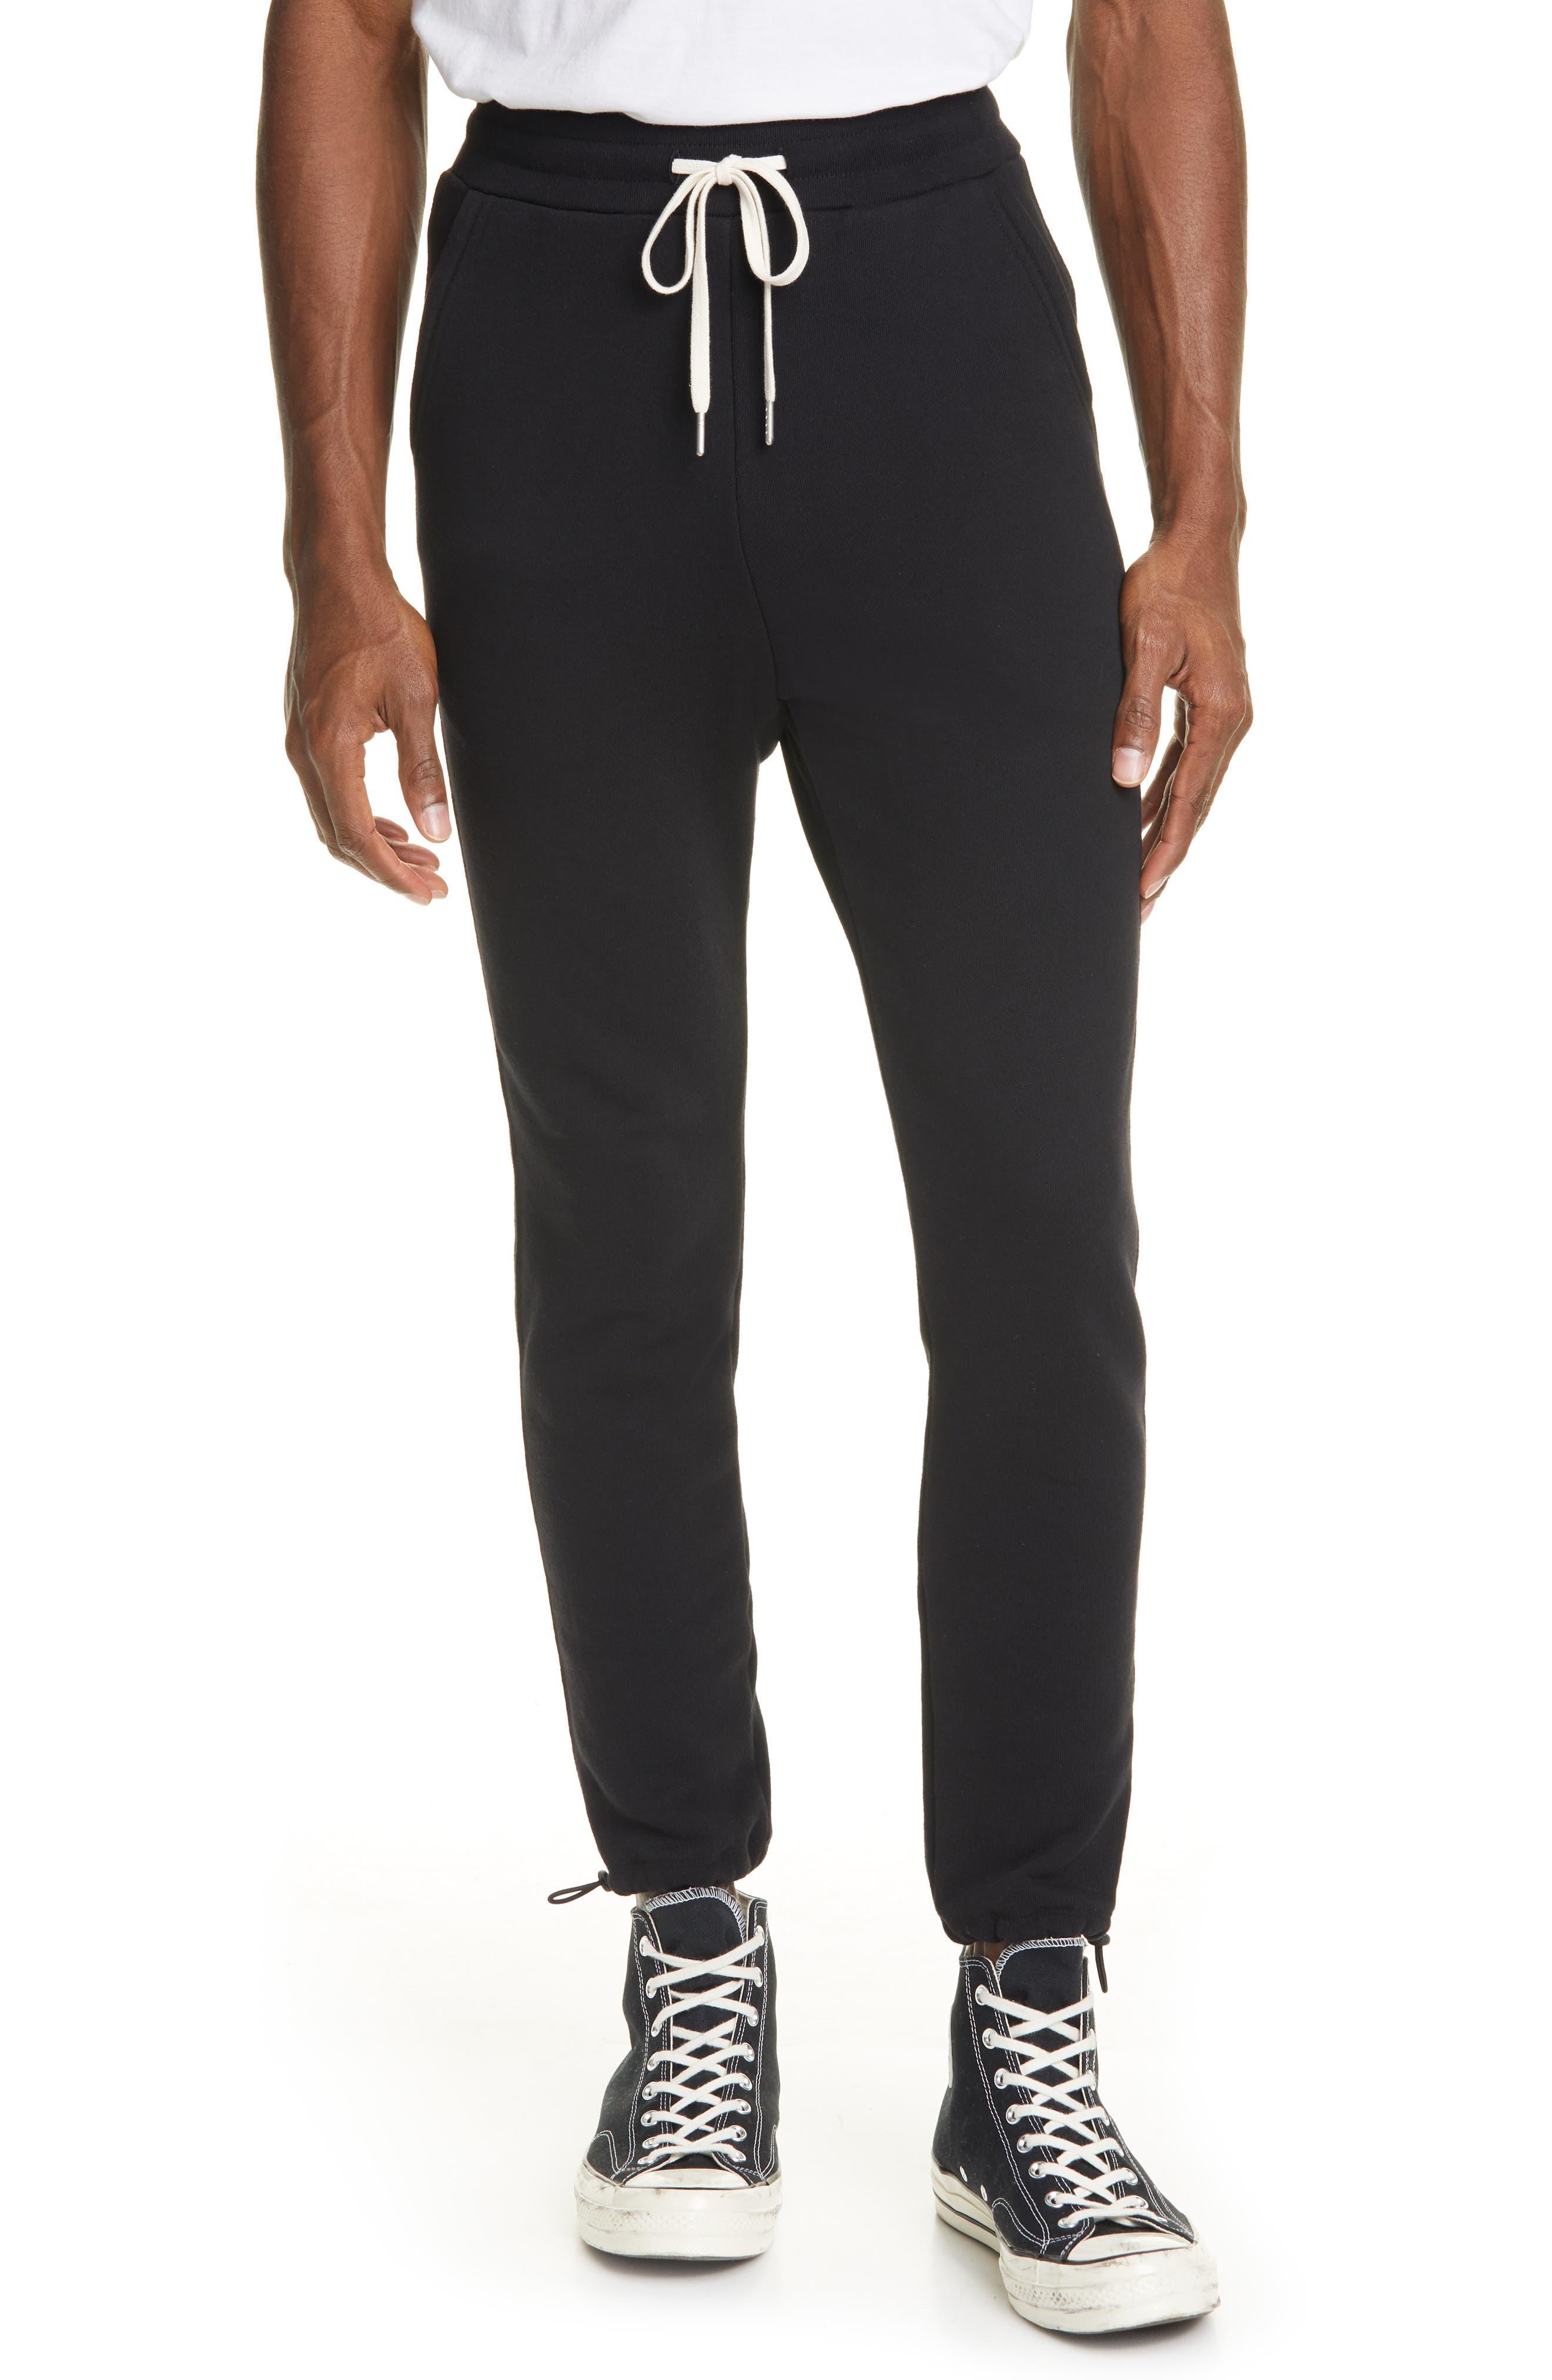 Men's John Elliott Sochi French Terry Sweatpants